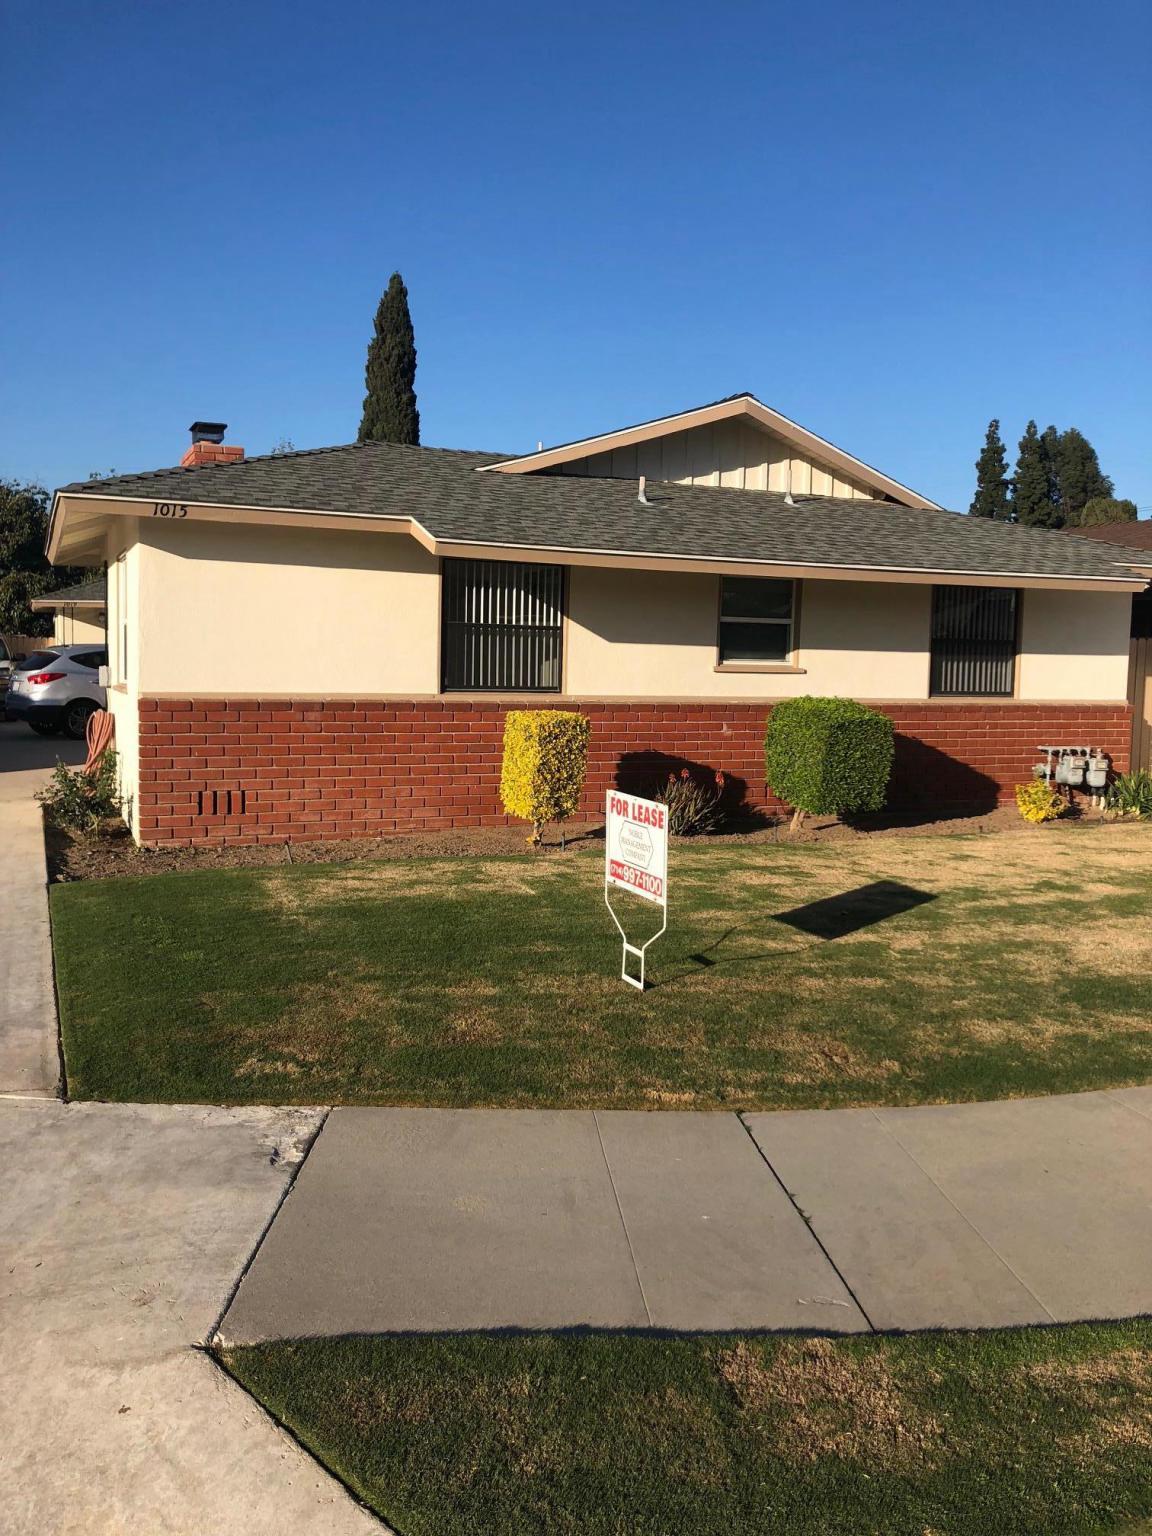 1015 E Washington Ave, Orange, CA 92866 For Rent   Trulia